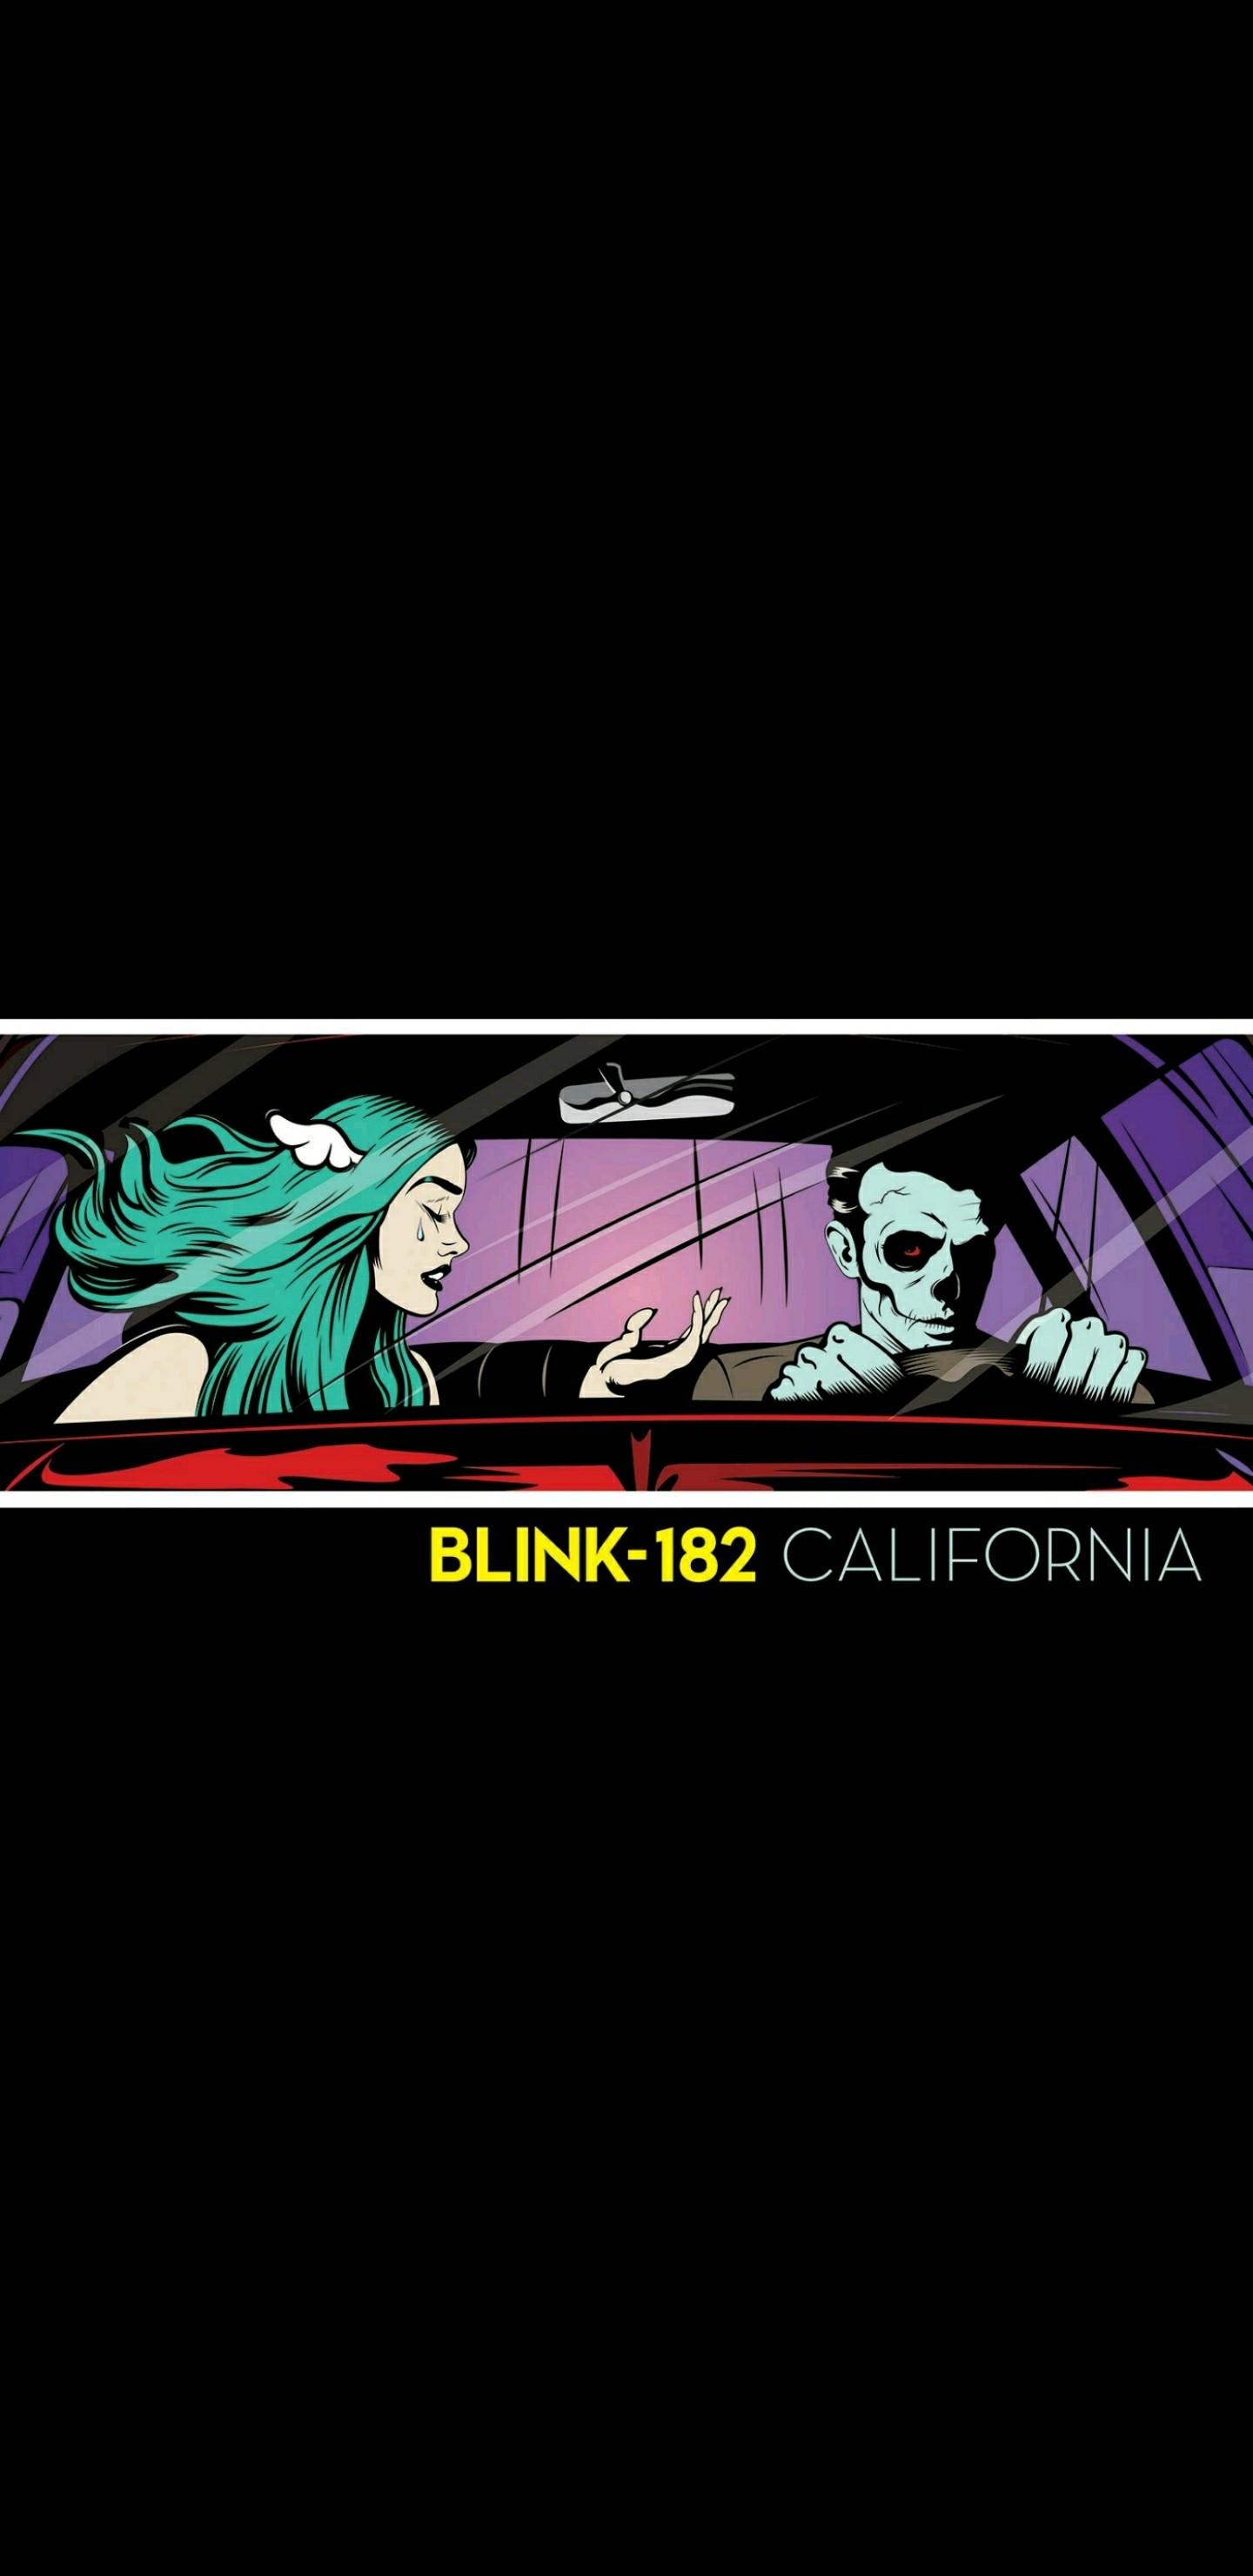 43 Blink 182 Wallpapers Blink 182 Iphone Wallpaper   Blink 182 1440x2960